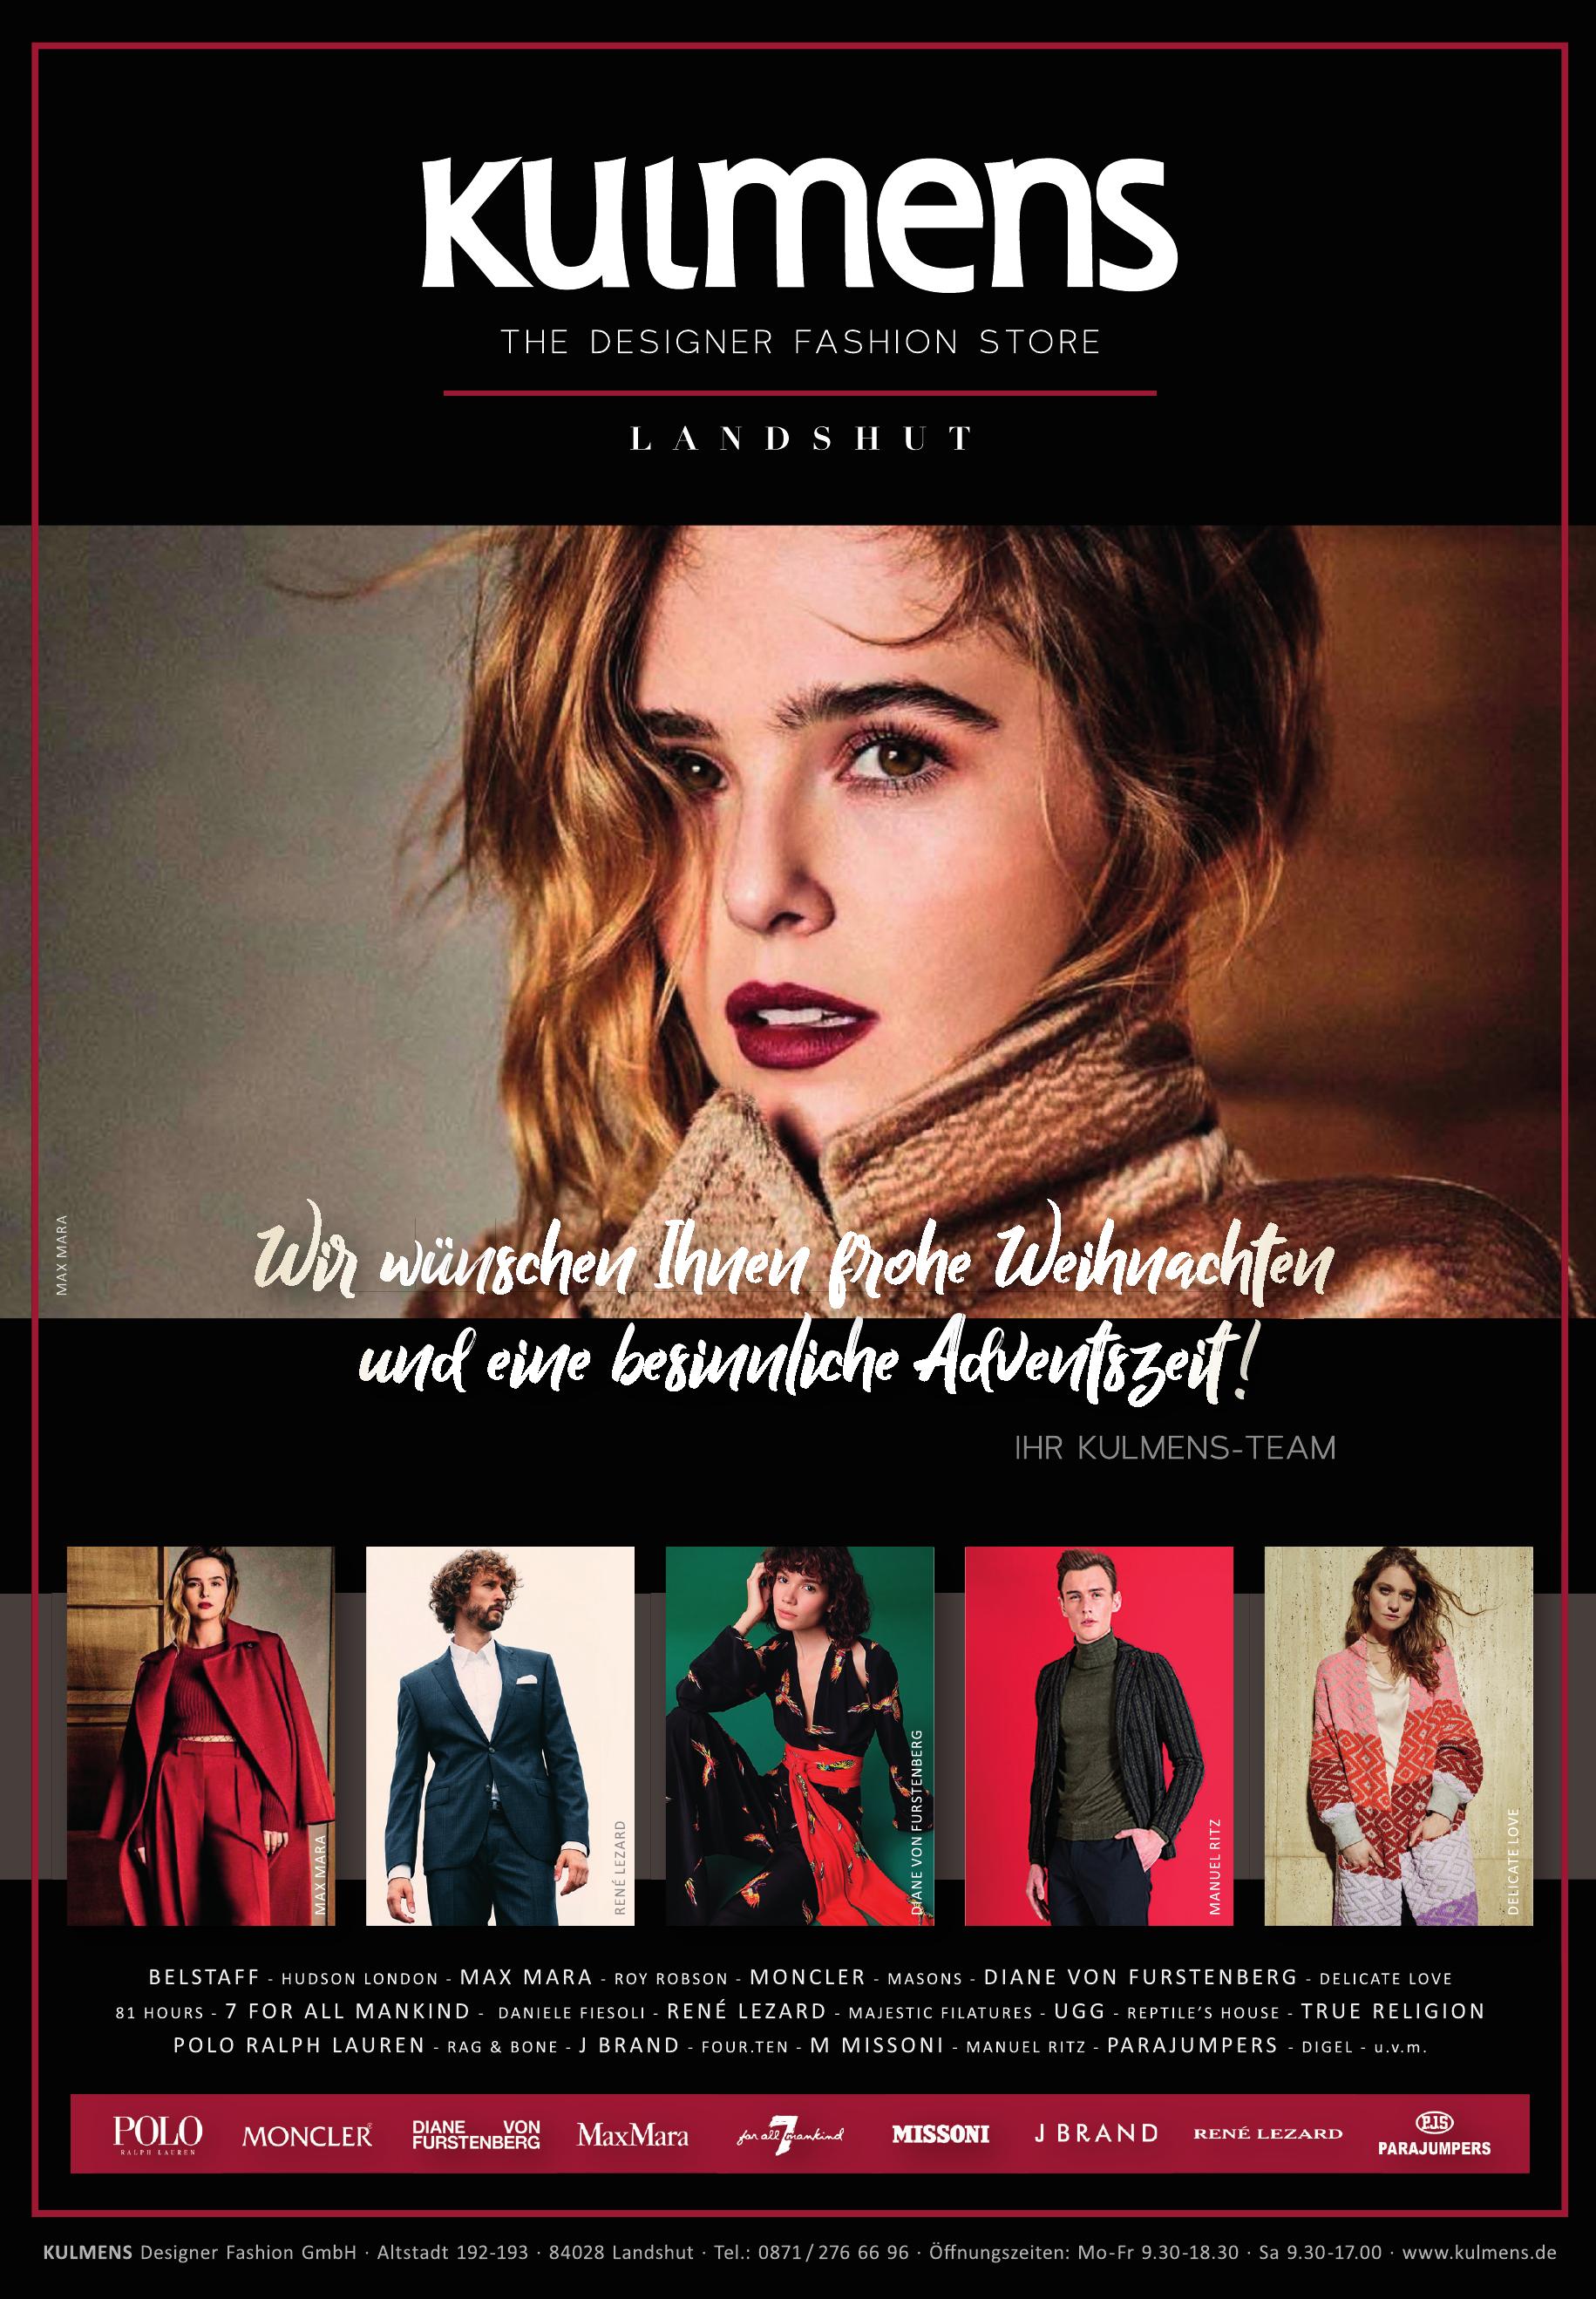 KULMENS Designer Fashion GmbH